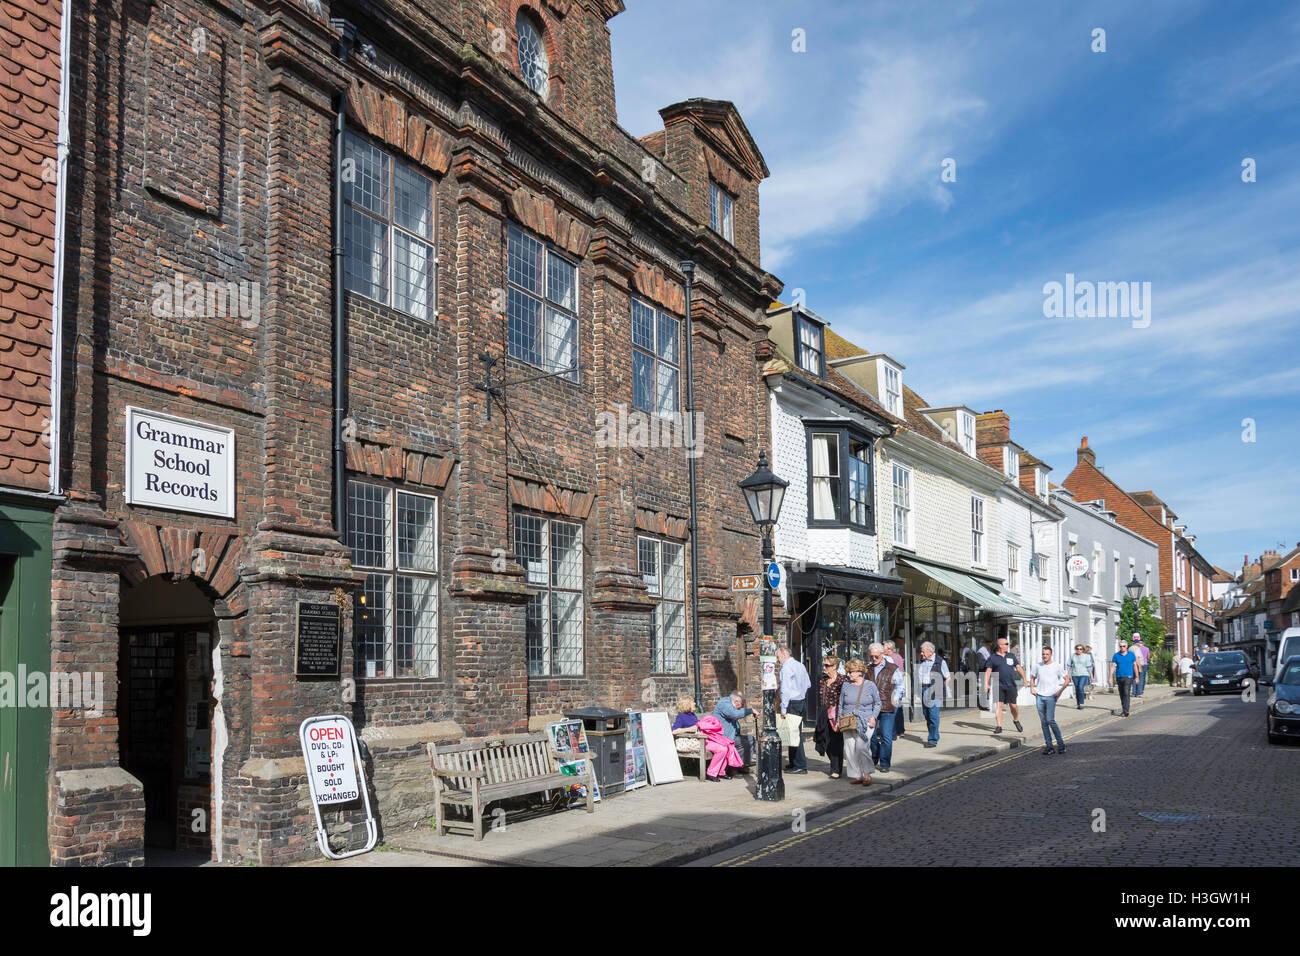 High Street, Rye, East Sussex, England, United Kingdom - Stock Image